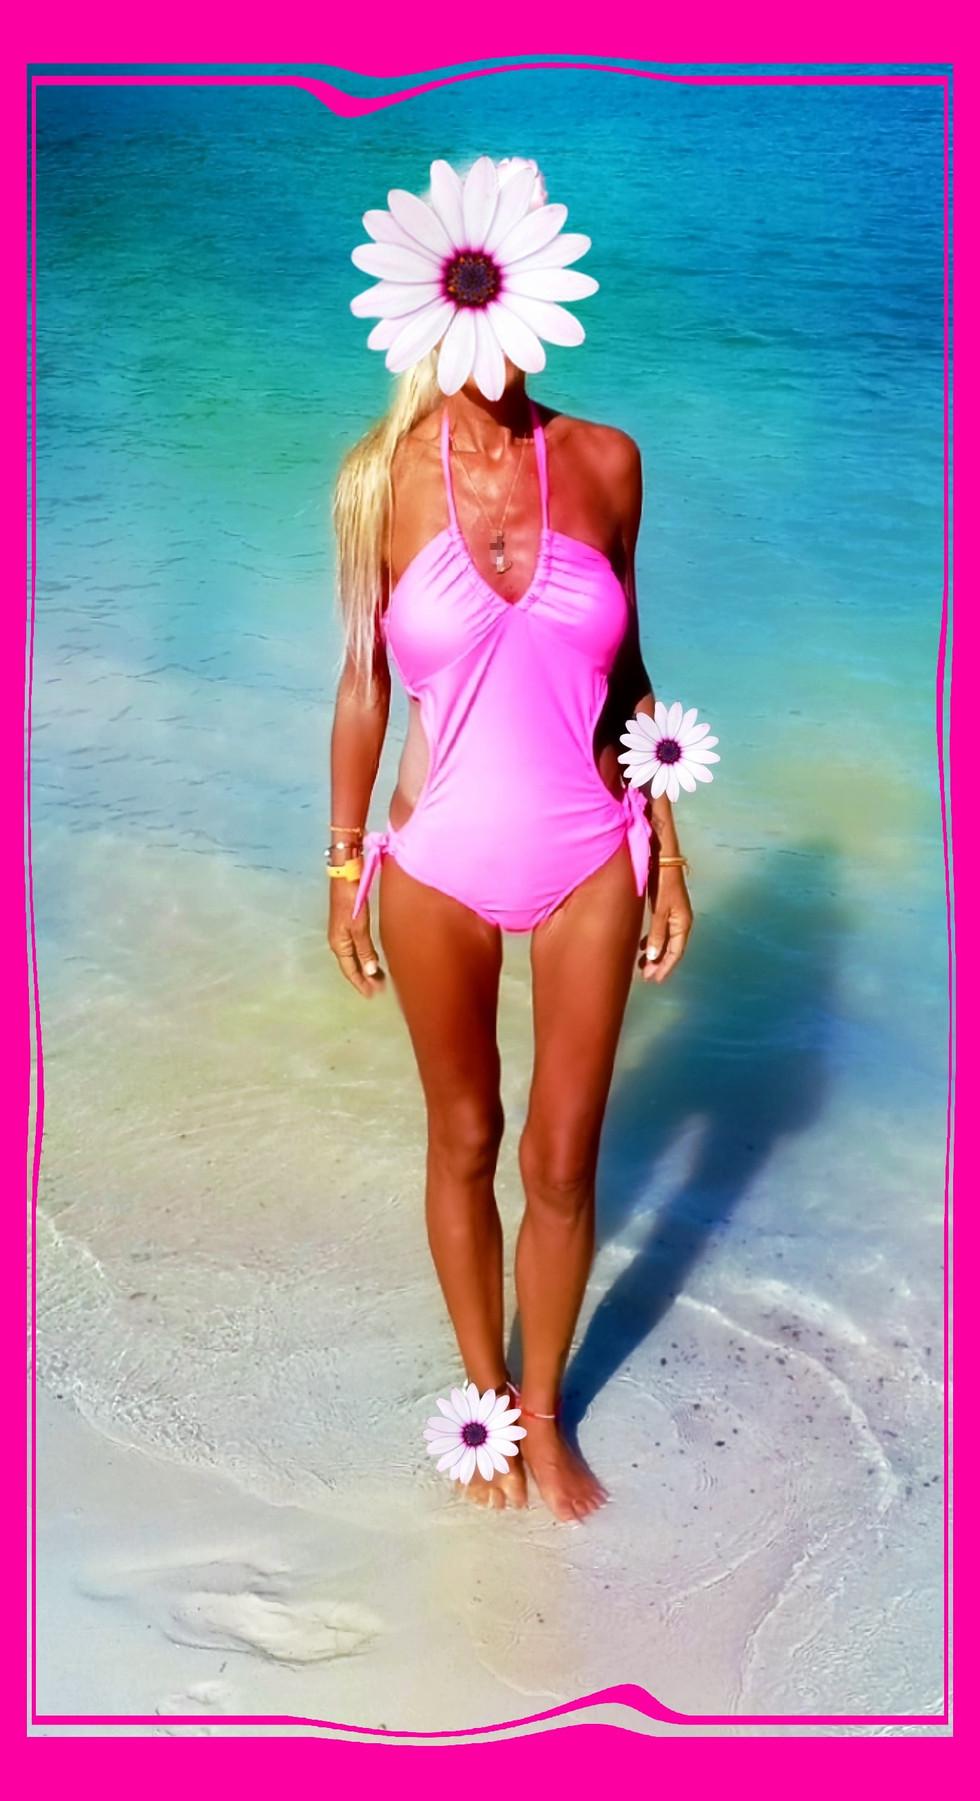 miss beach pink diff xxx.jpg